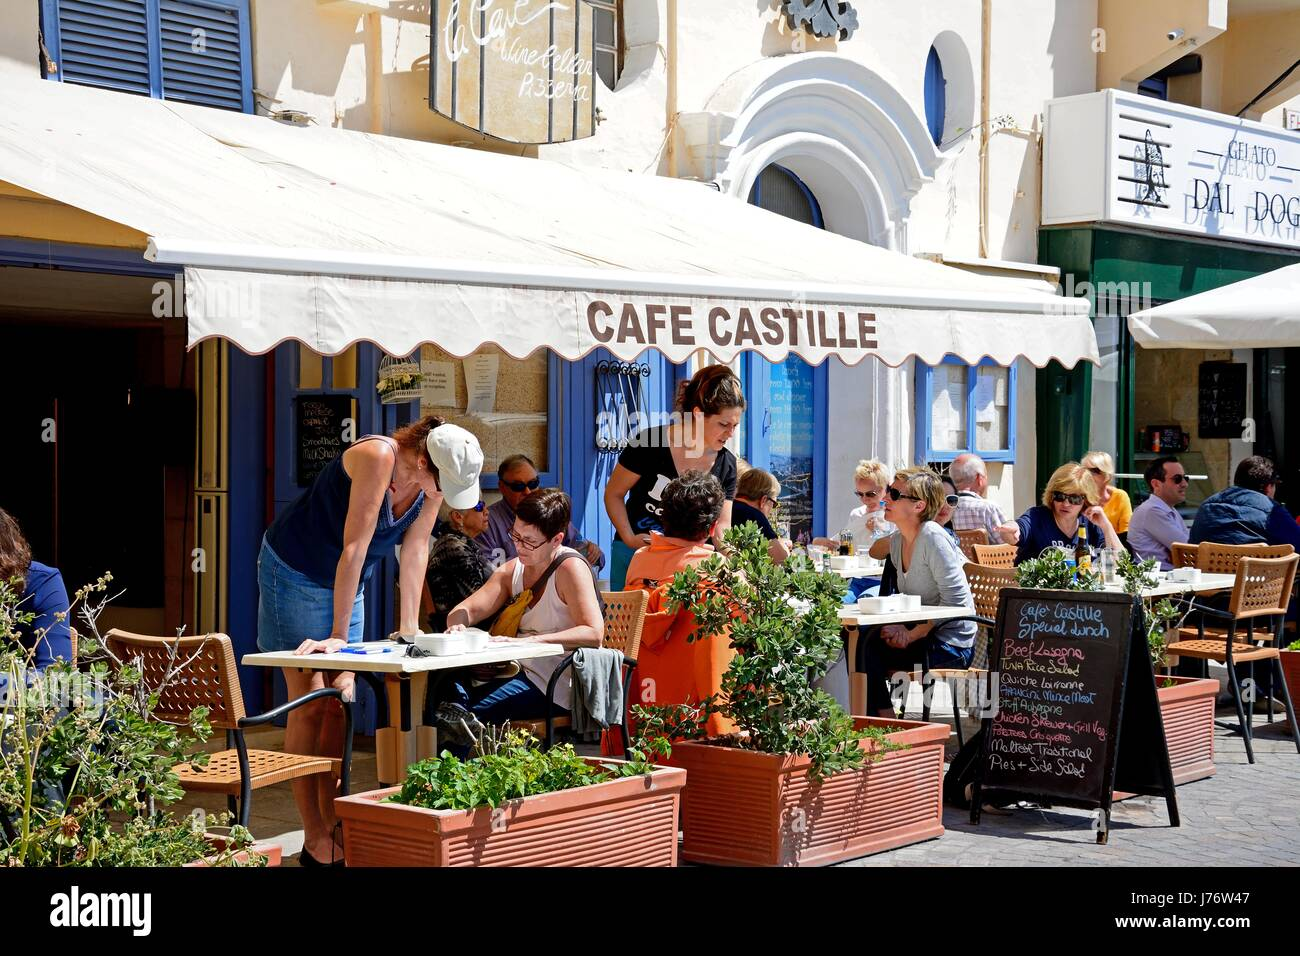 Pavement cafe in the Castille Hotel, Valletta, Malta, Europe. - Stock Image